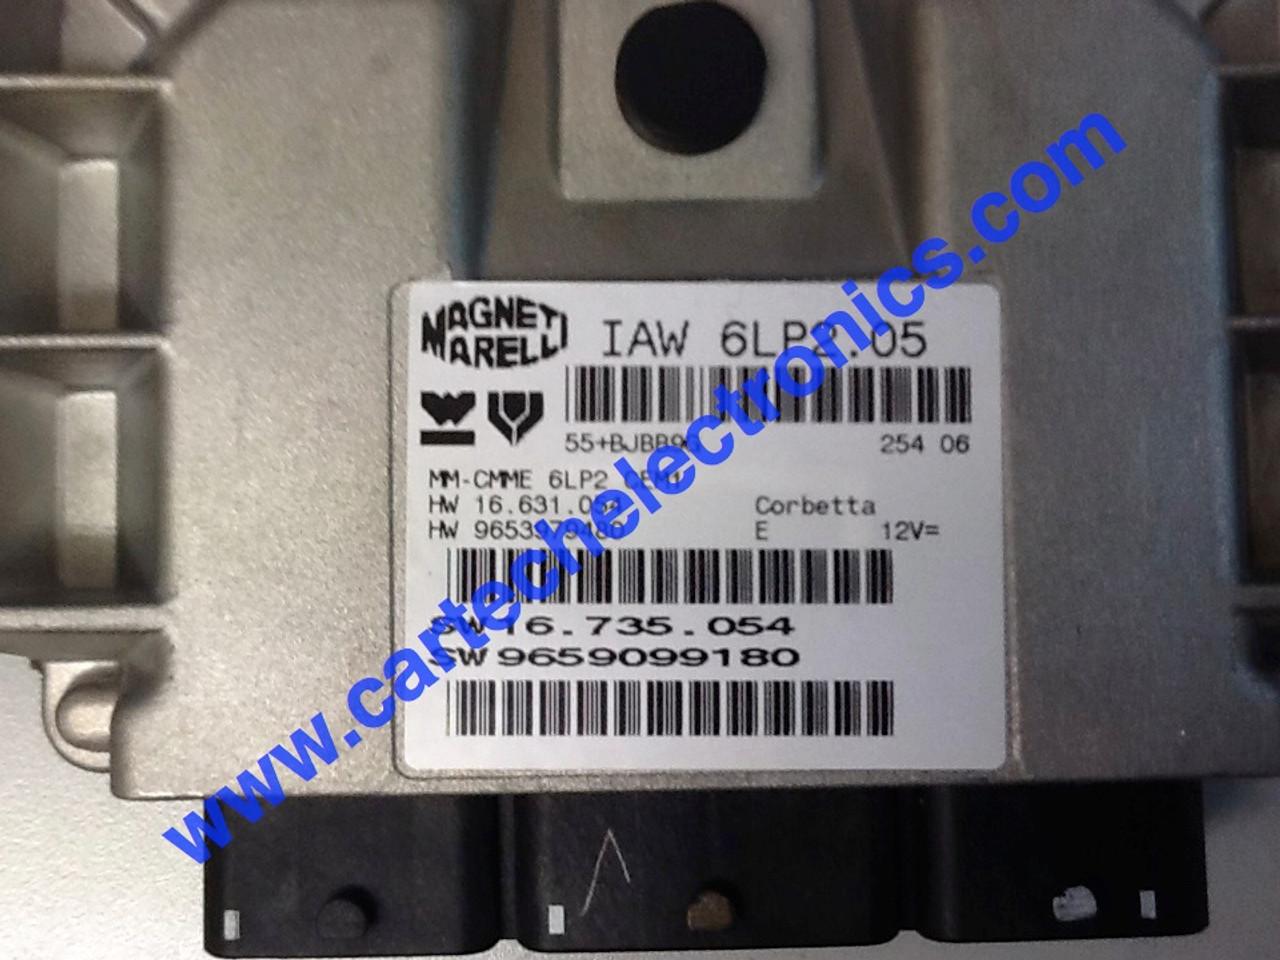 Plug & Play or Reset Engine ECU IAW 6LP2.01